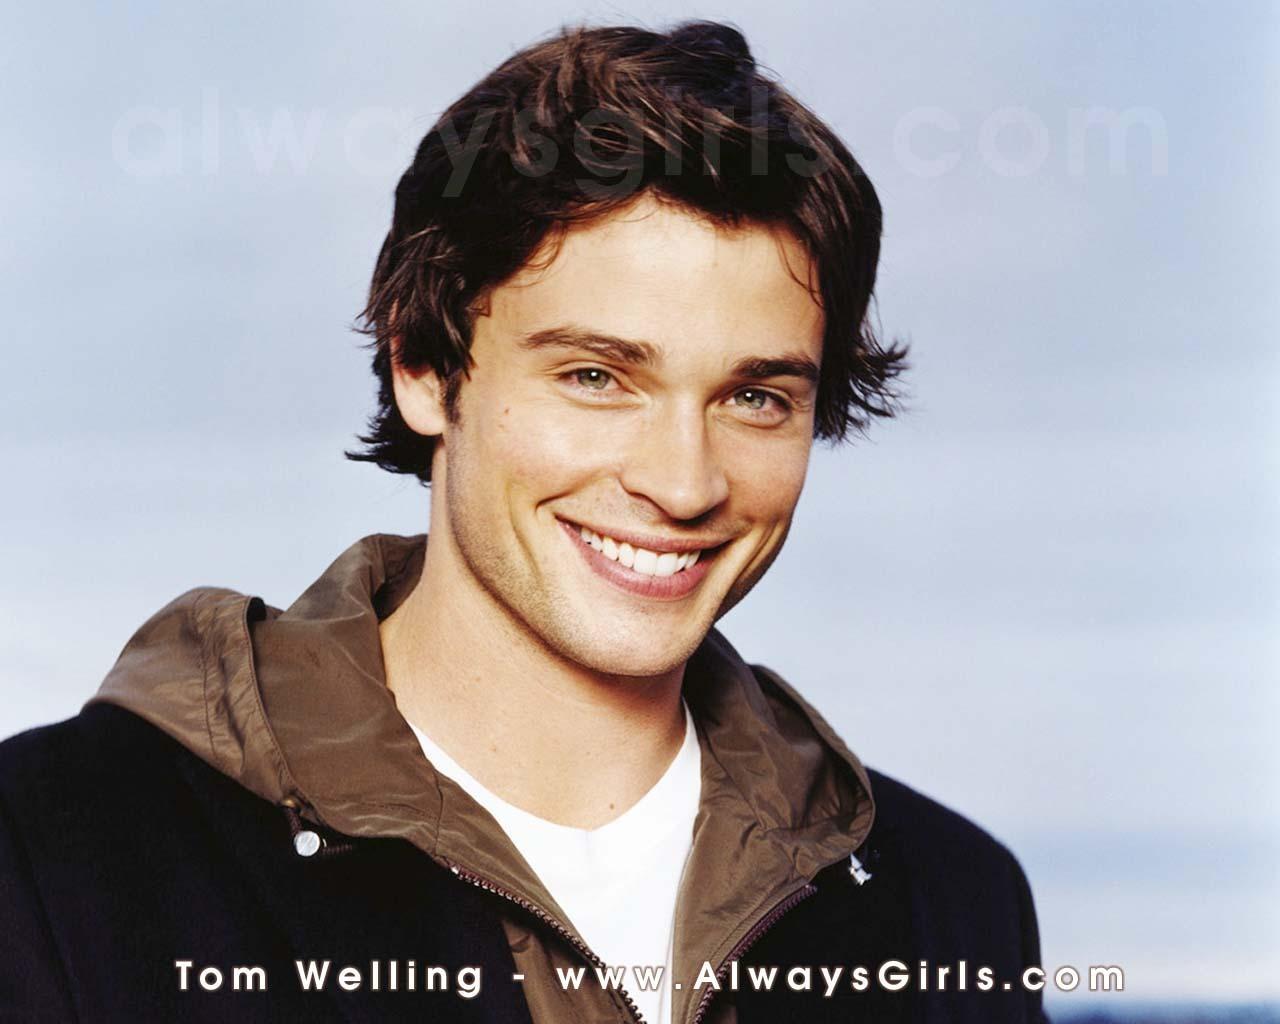 Tom Welling   Hottest Actors Wallpaper 2964415 1280x1024